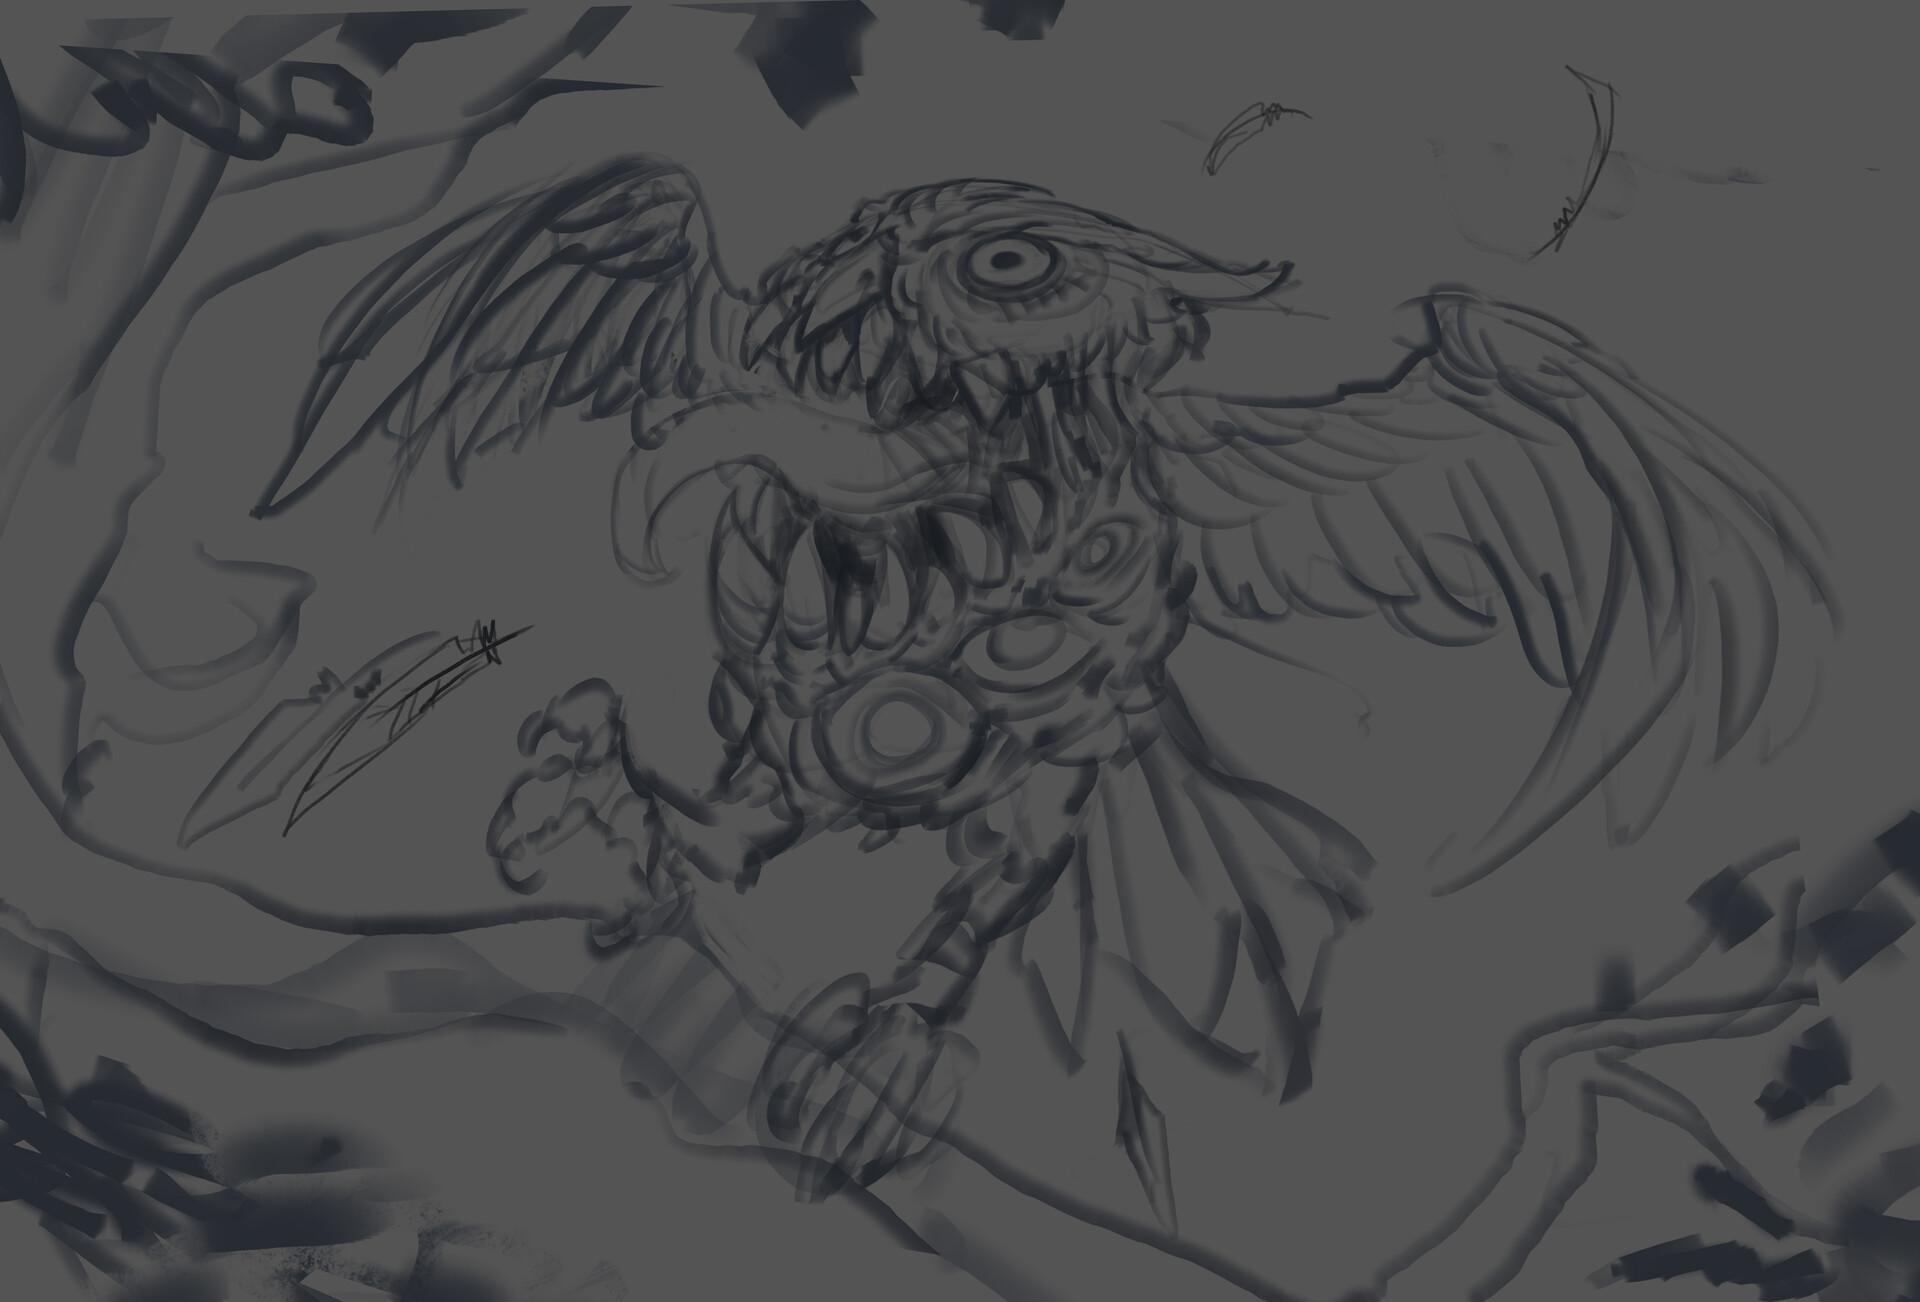 Thomas bourdon night owl sketch